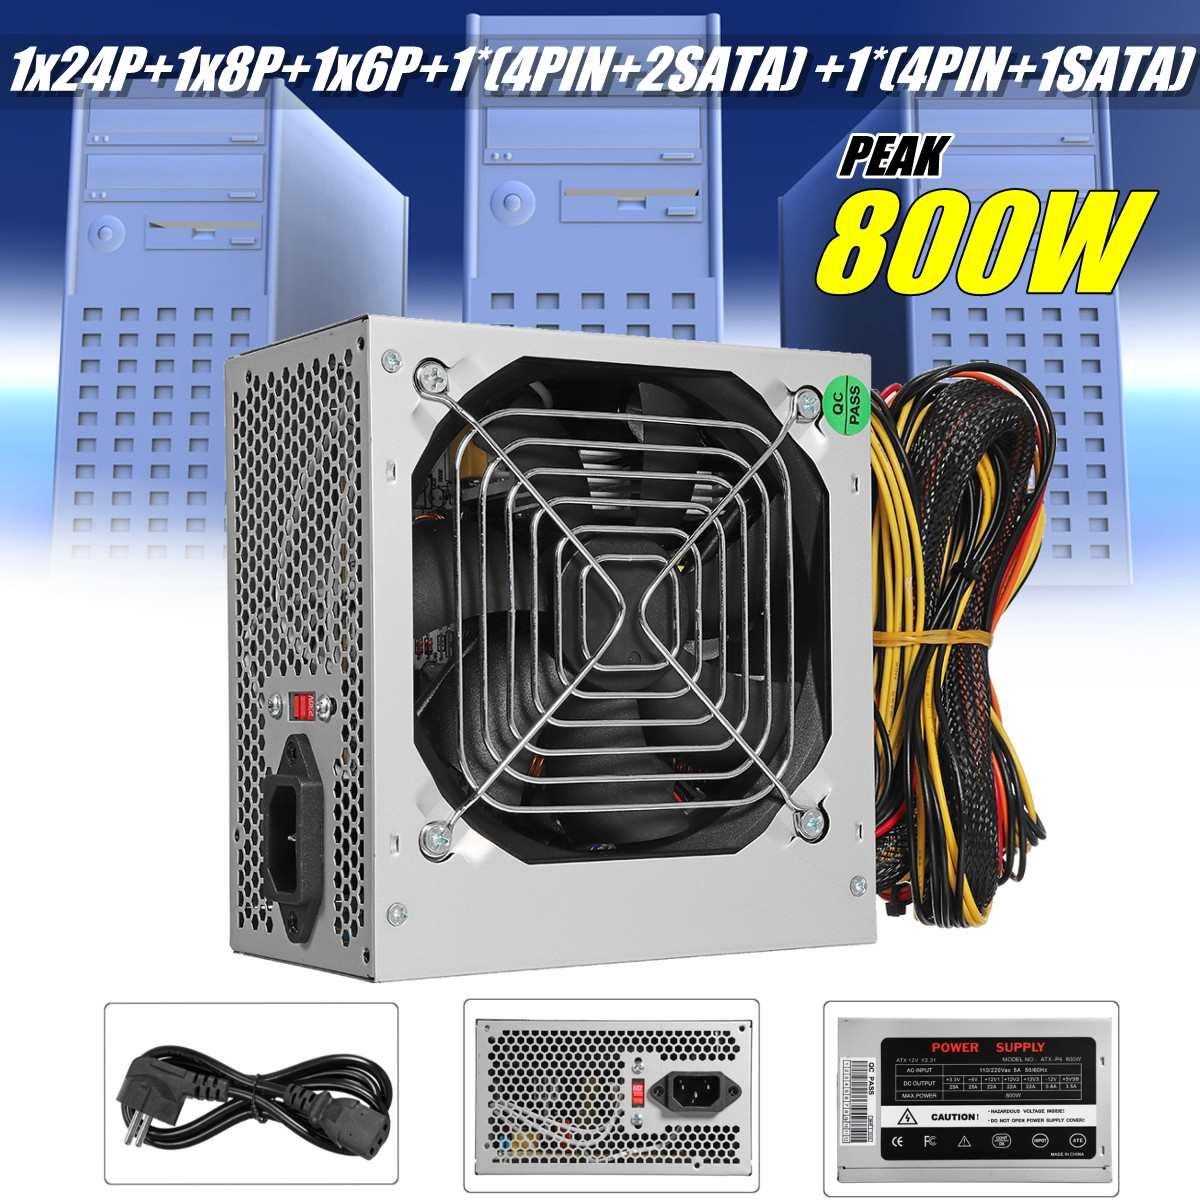 Max 800 W alimentation PSU PFC ventilateur silencieux ATX 24 broches 12 V PC ordinateur SATA PC de jeu alimentation pour ordinateur Intel AMD